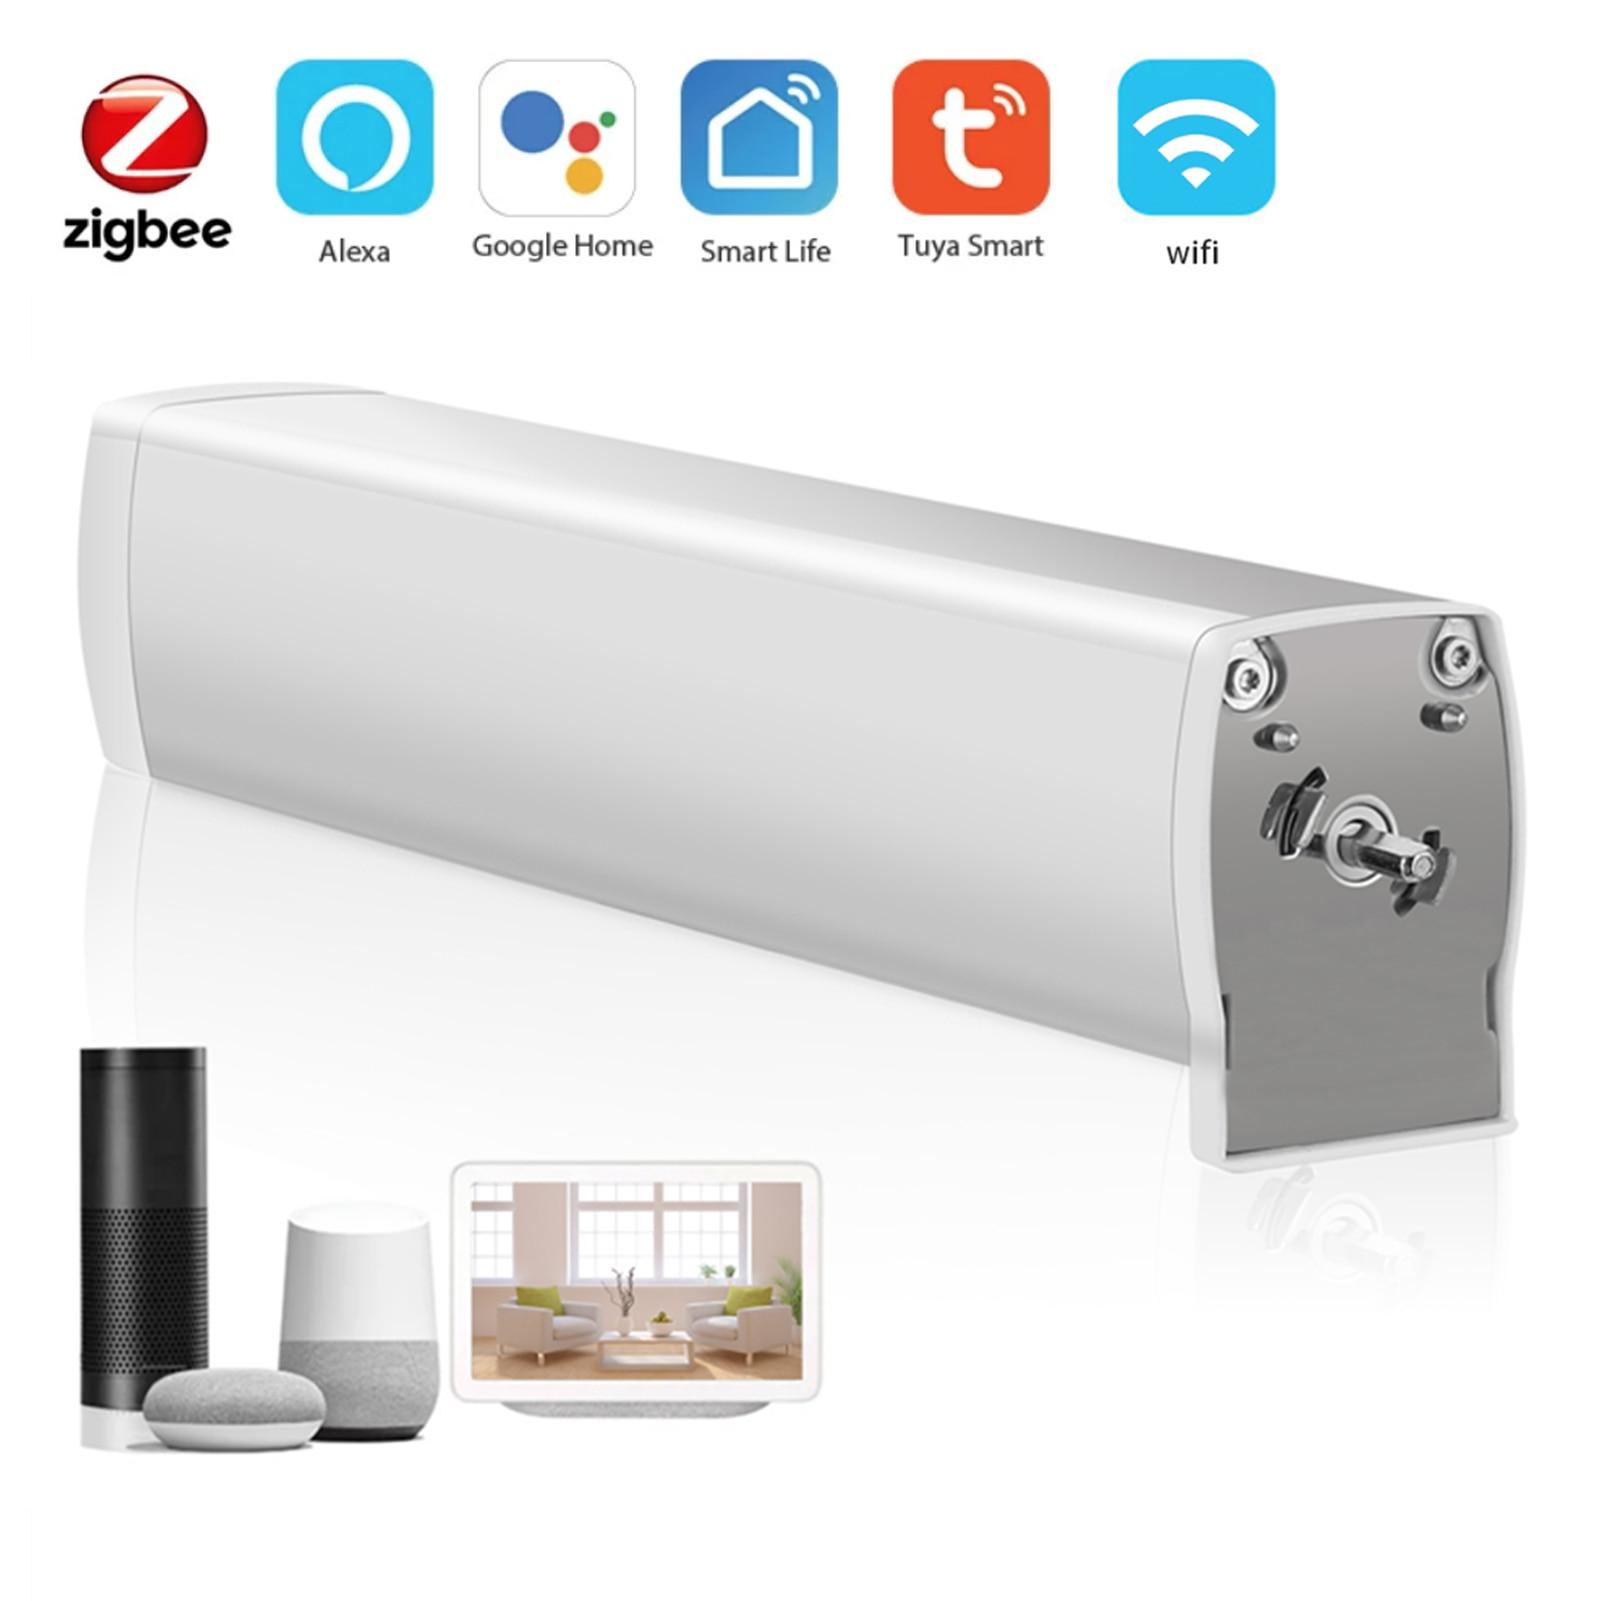 tuya wifi zigbee cortina cego interruptor eletrico motorizado cortina de controle